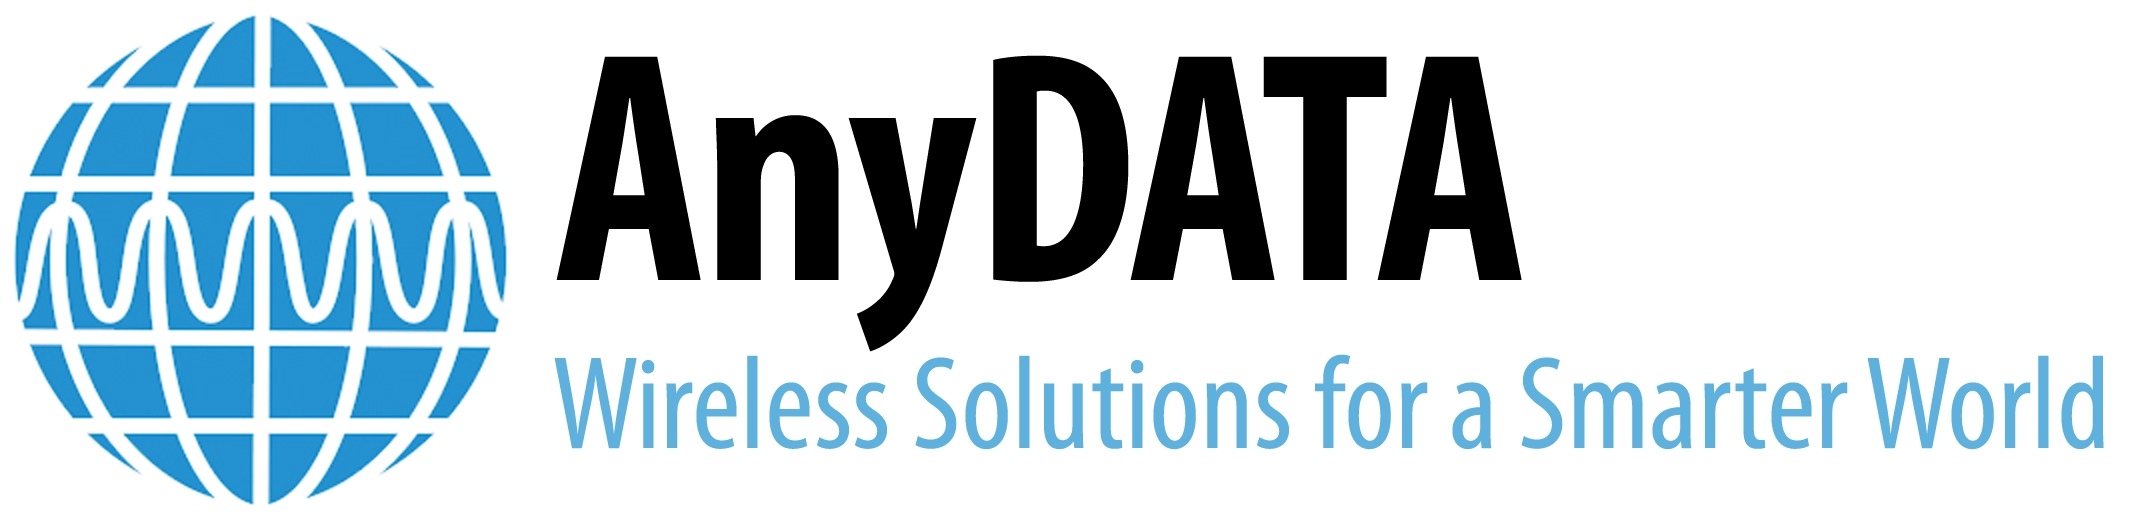 anydata-logo